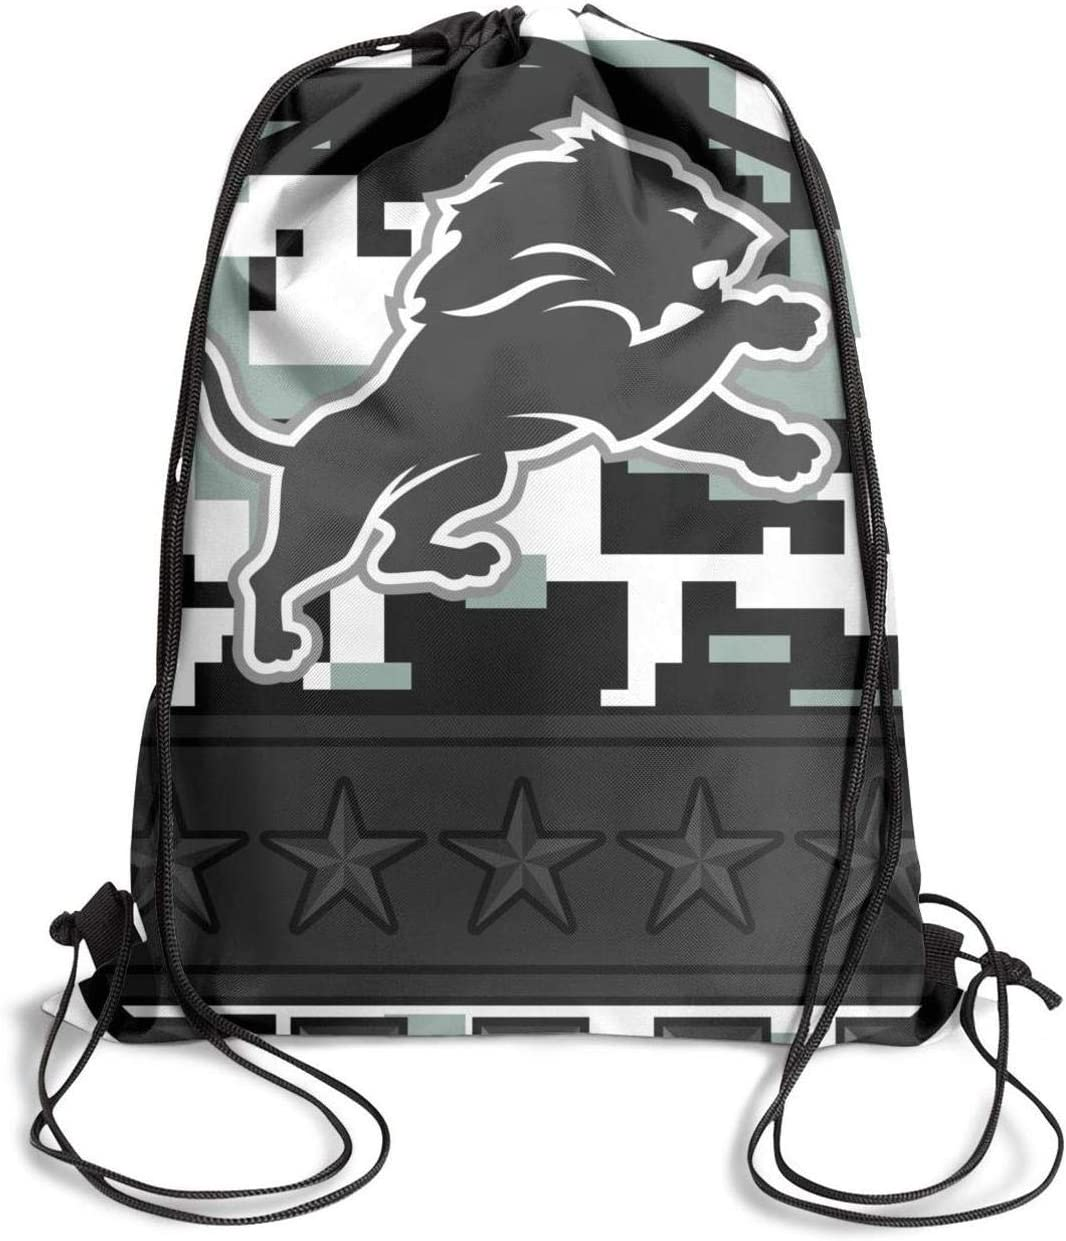 Amazon.com: KSEERBABALL Gym Drawstring Bag Large Size ...